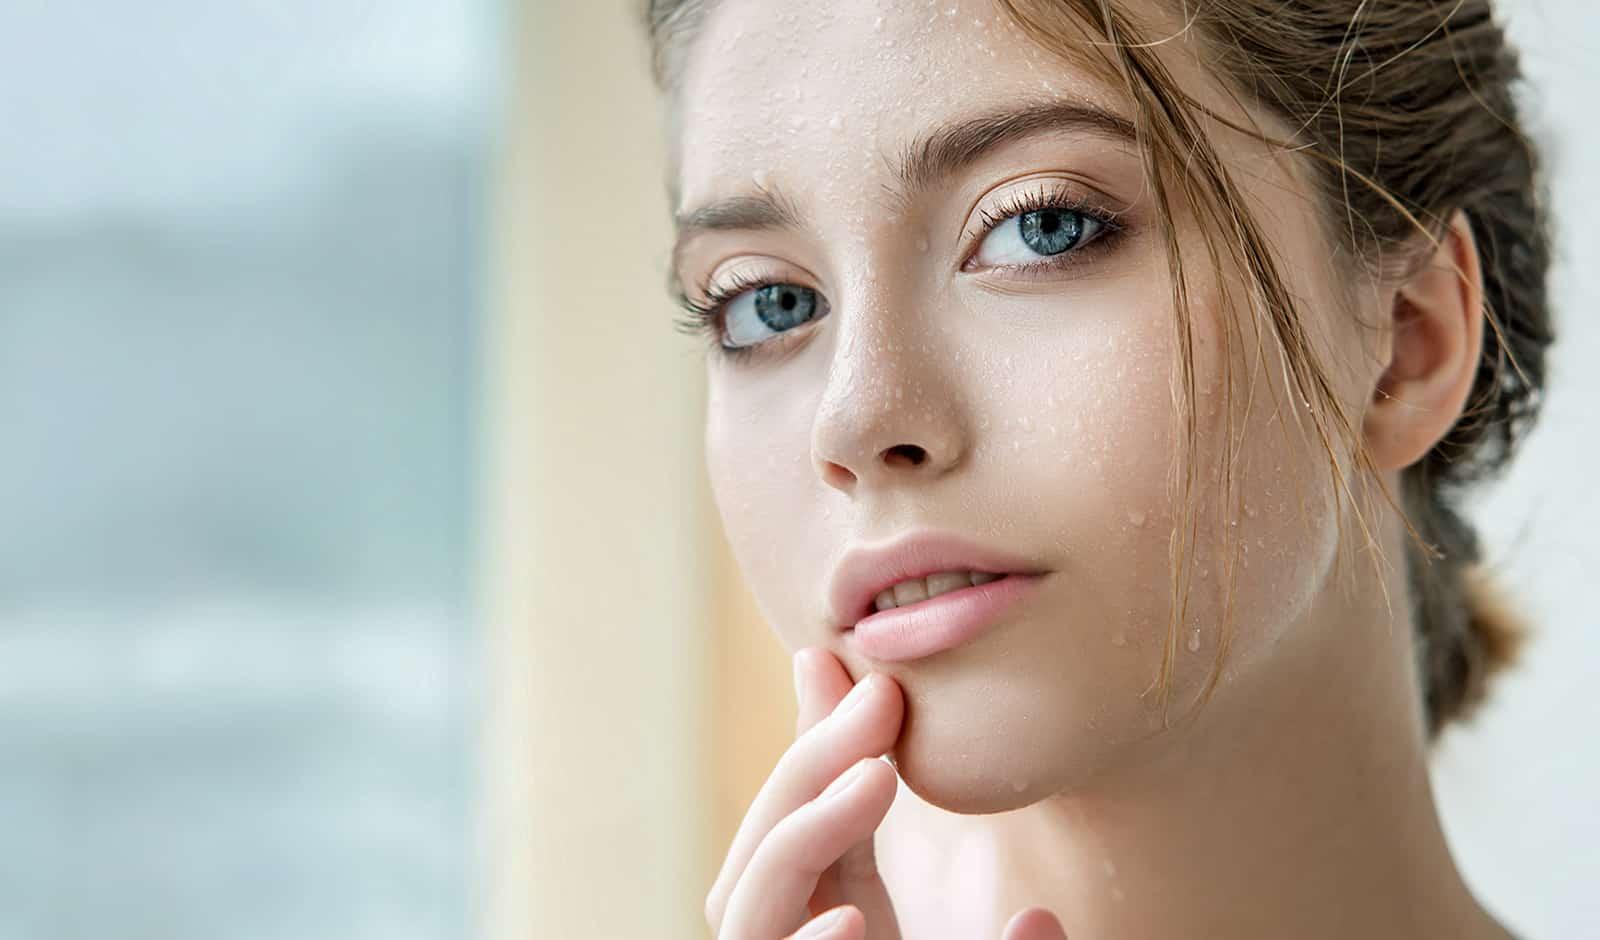 skincare-tips-to-keep-you-glam-this-festive-season-viva-glam-main-image